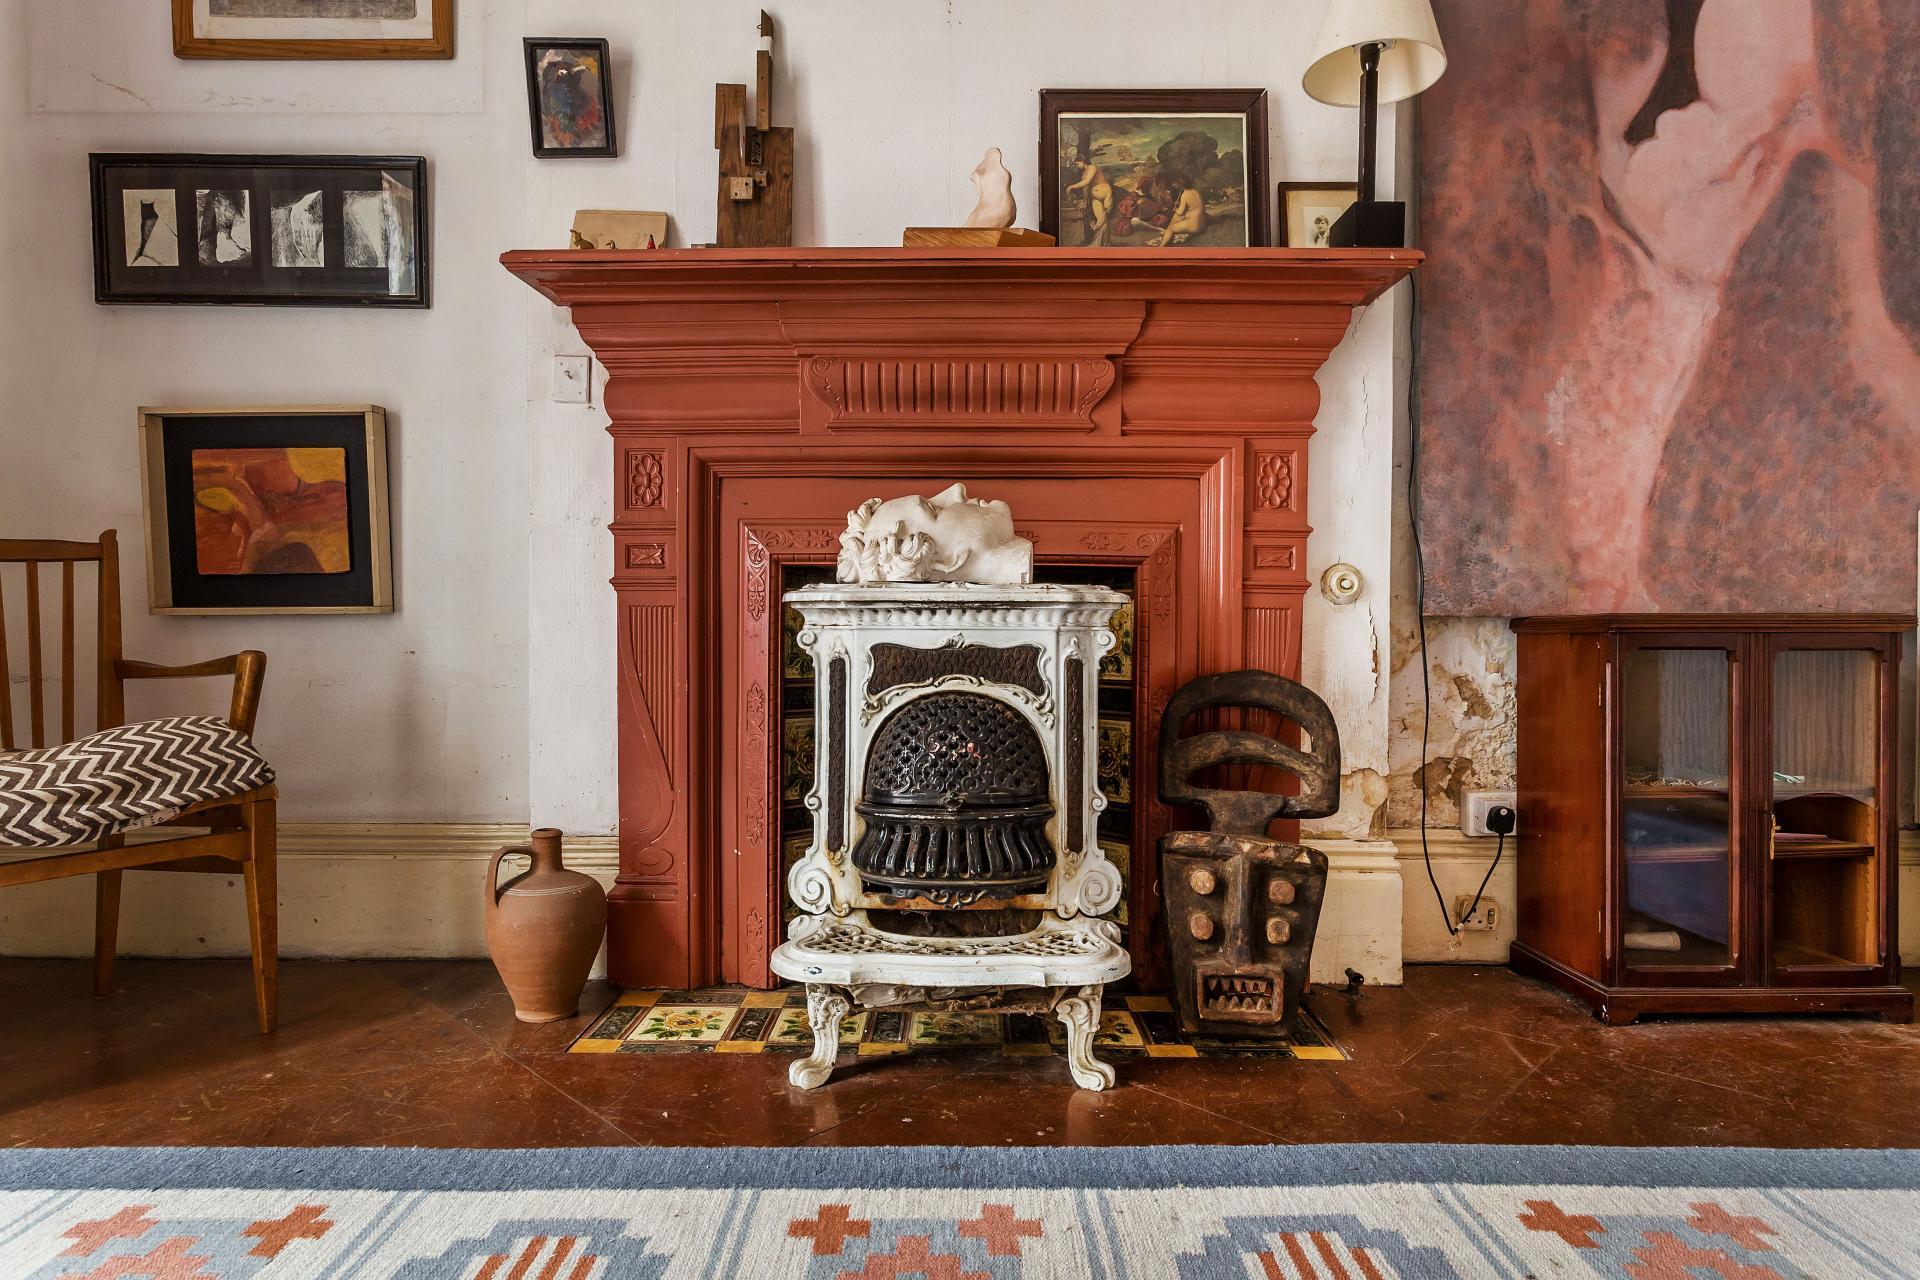 4 bedroom detached for sale in wallington